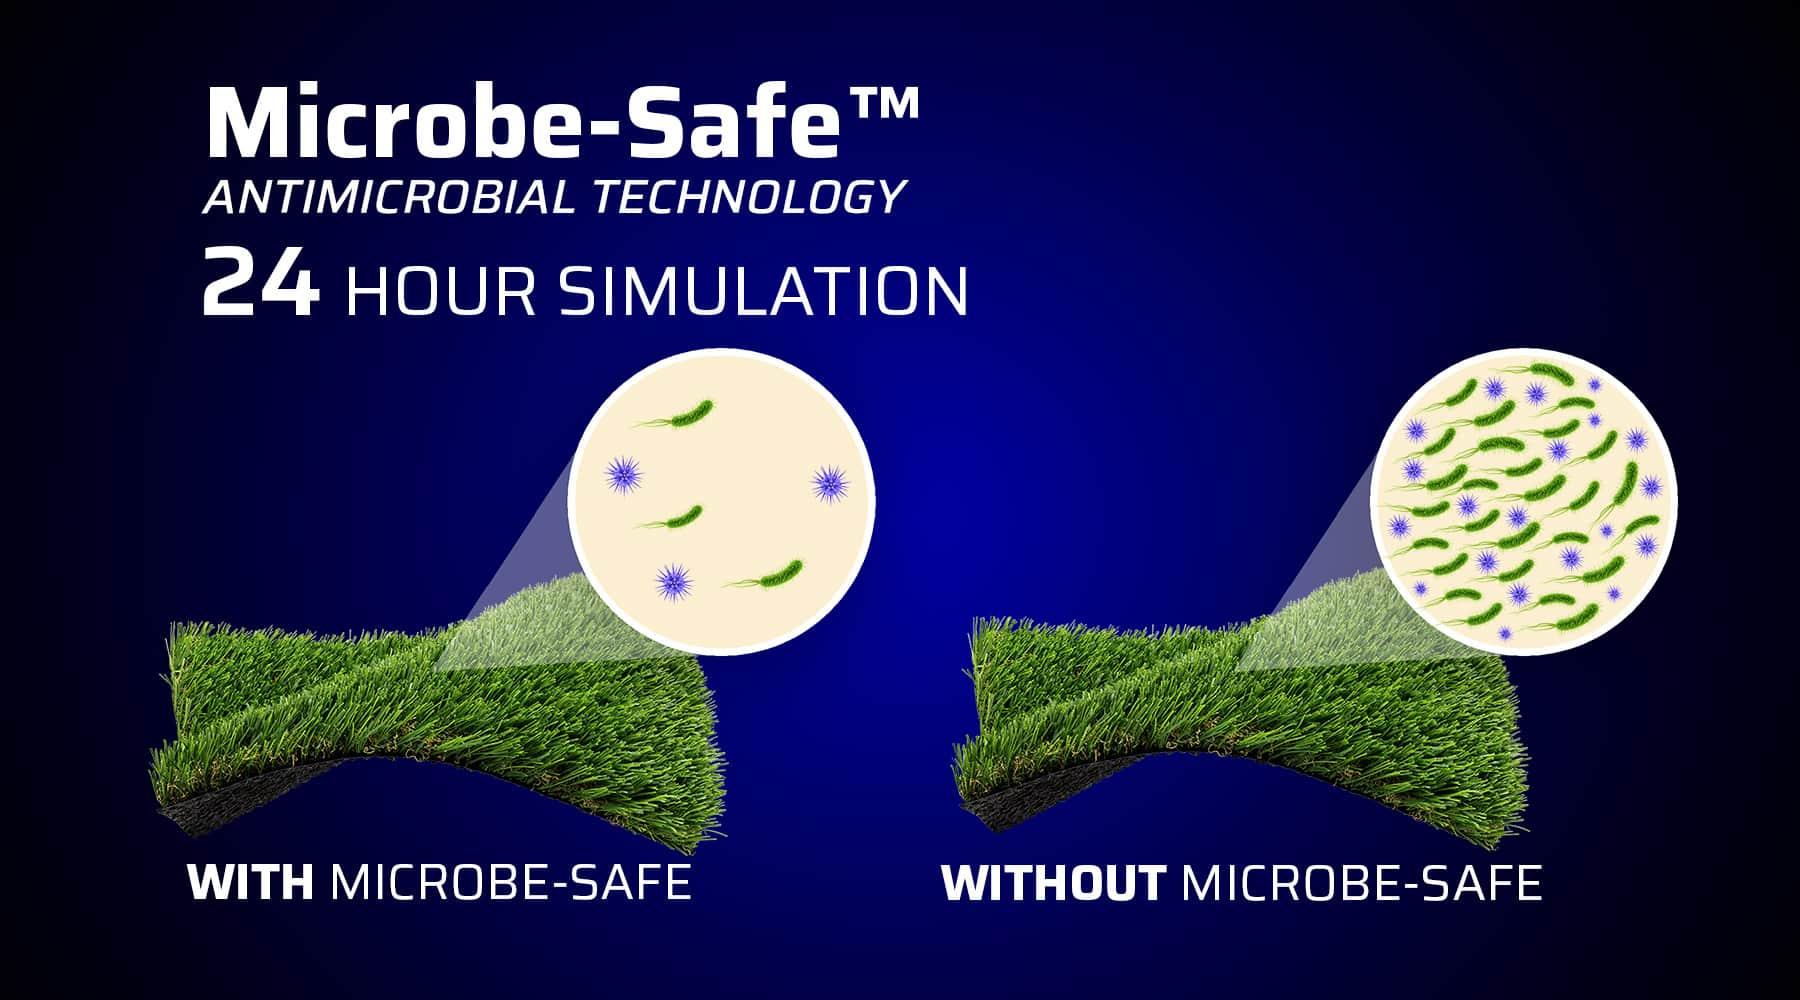 Microbe-Safe™-24 Hour Simulation